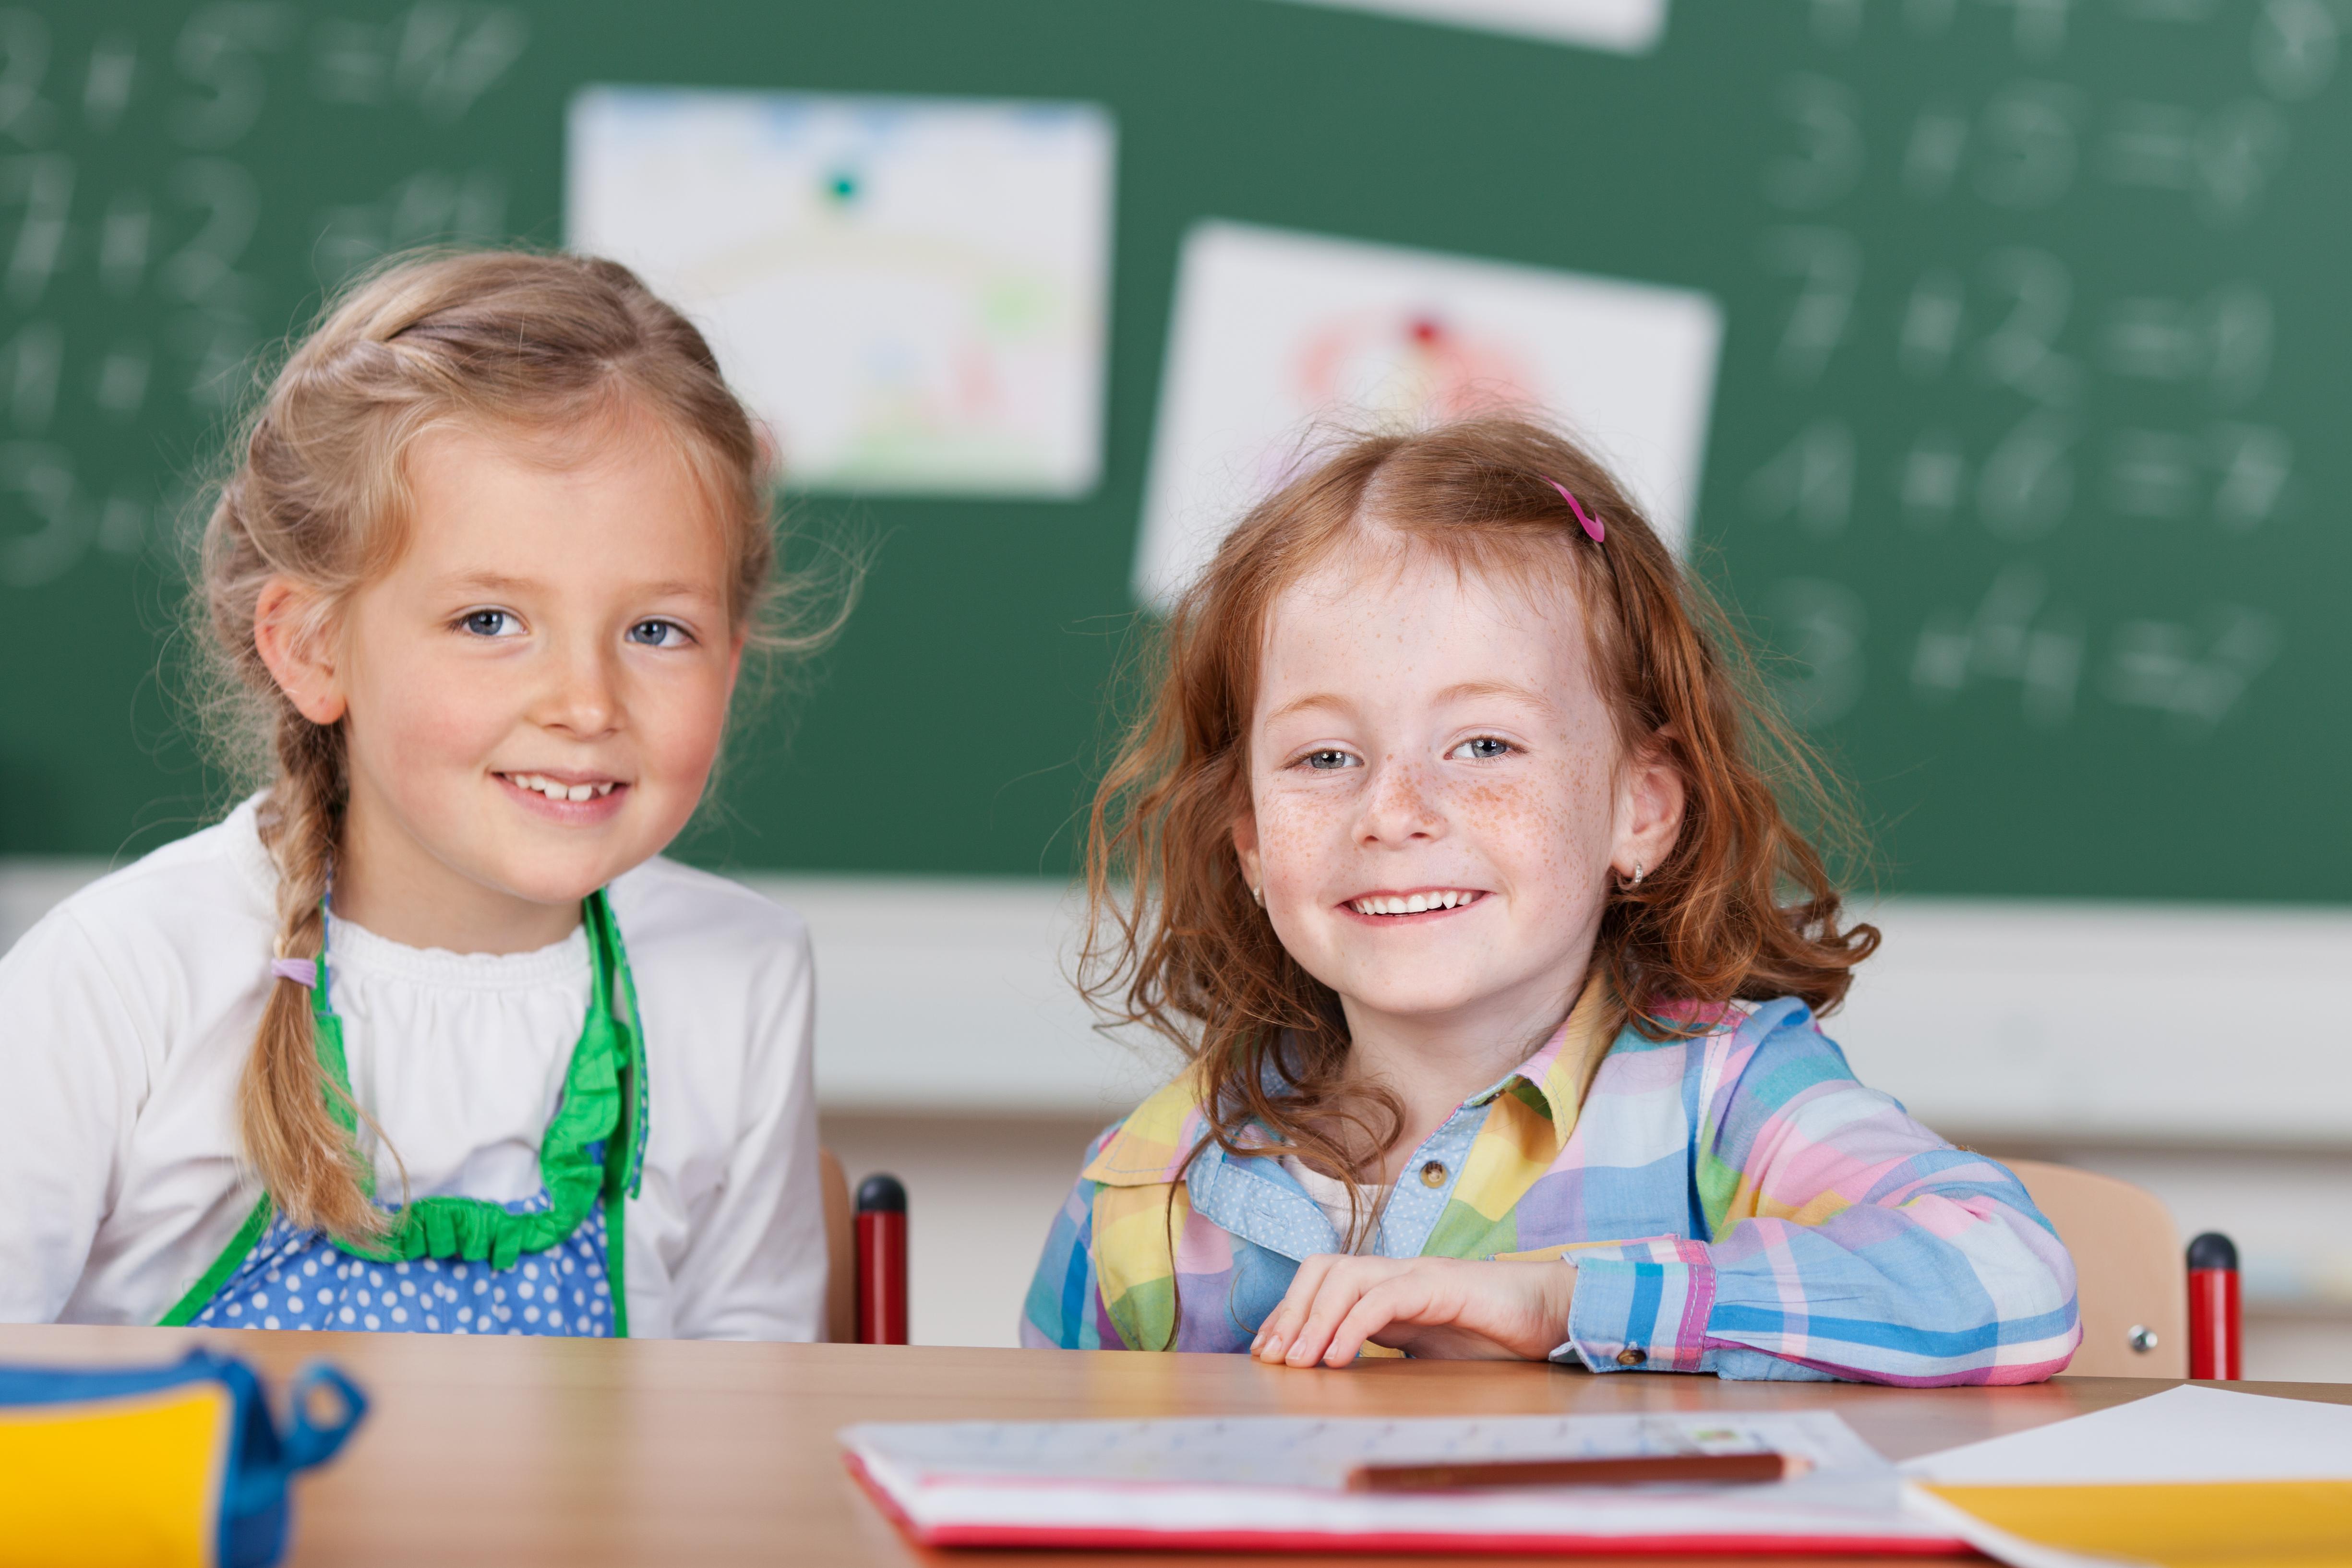 Two happy little girls in kindergarten